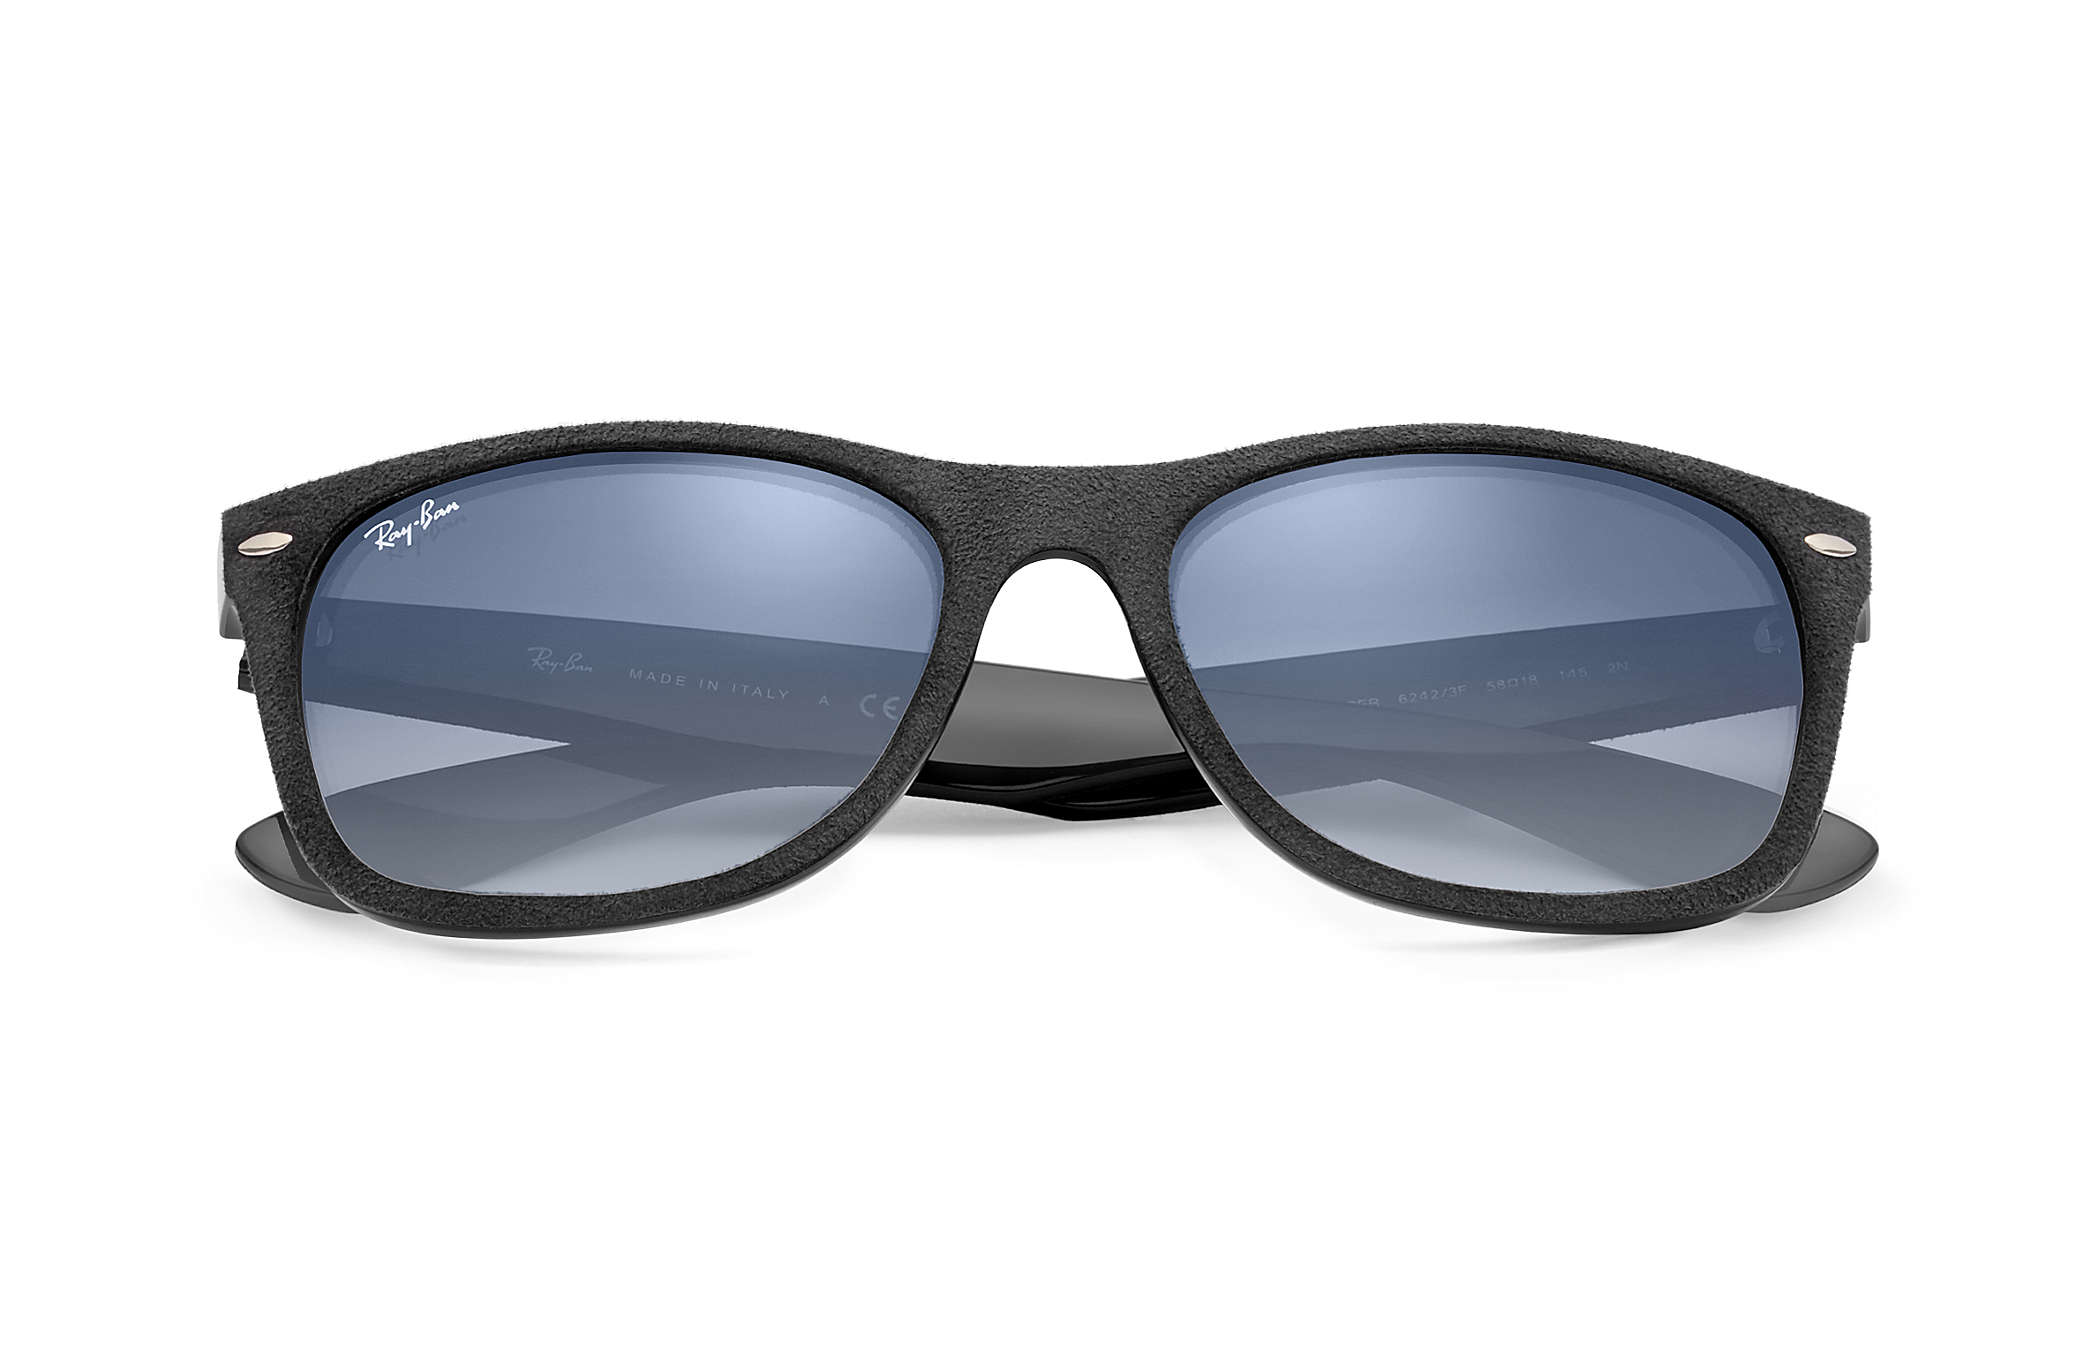 c0094320211 Ray-Ban New Wayfarer With Alcantara® RB2132 Black - Nylon - Light ...